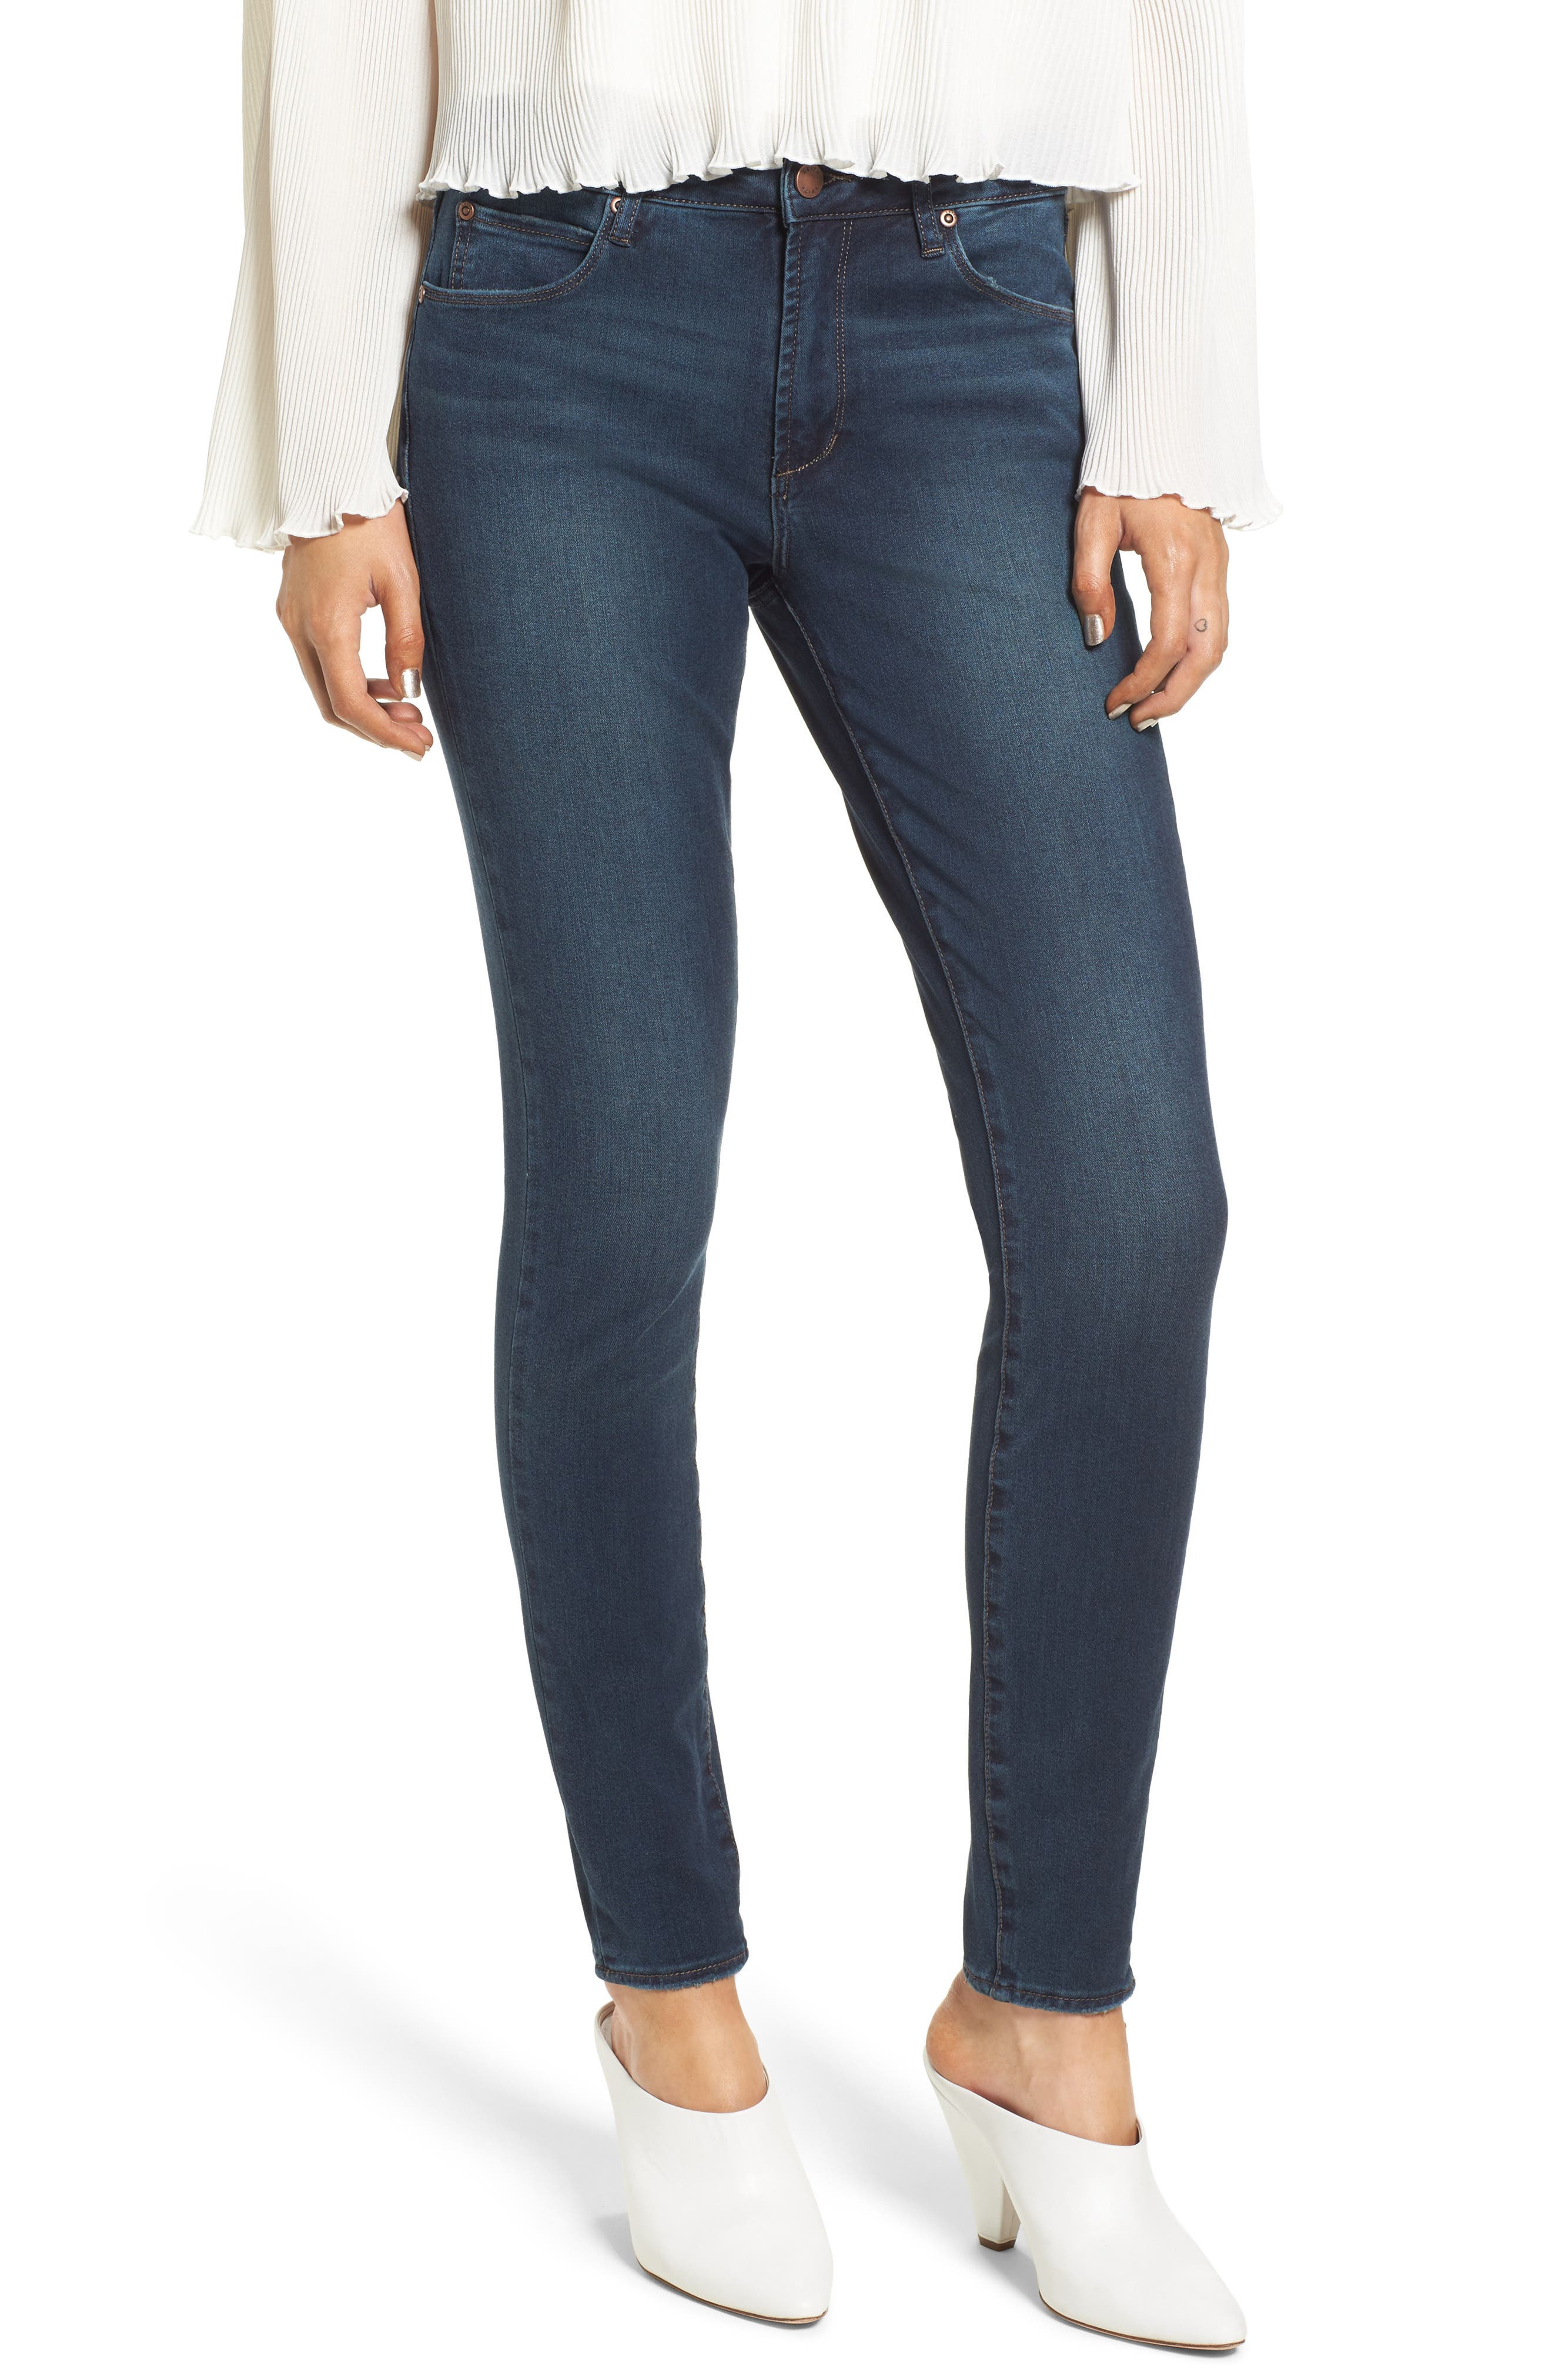 Main Image - Leith Skinny Jeans (Medium Wash)